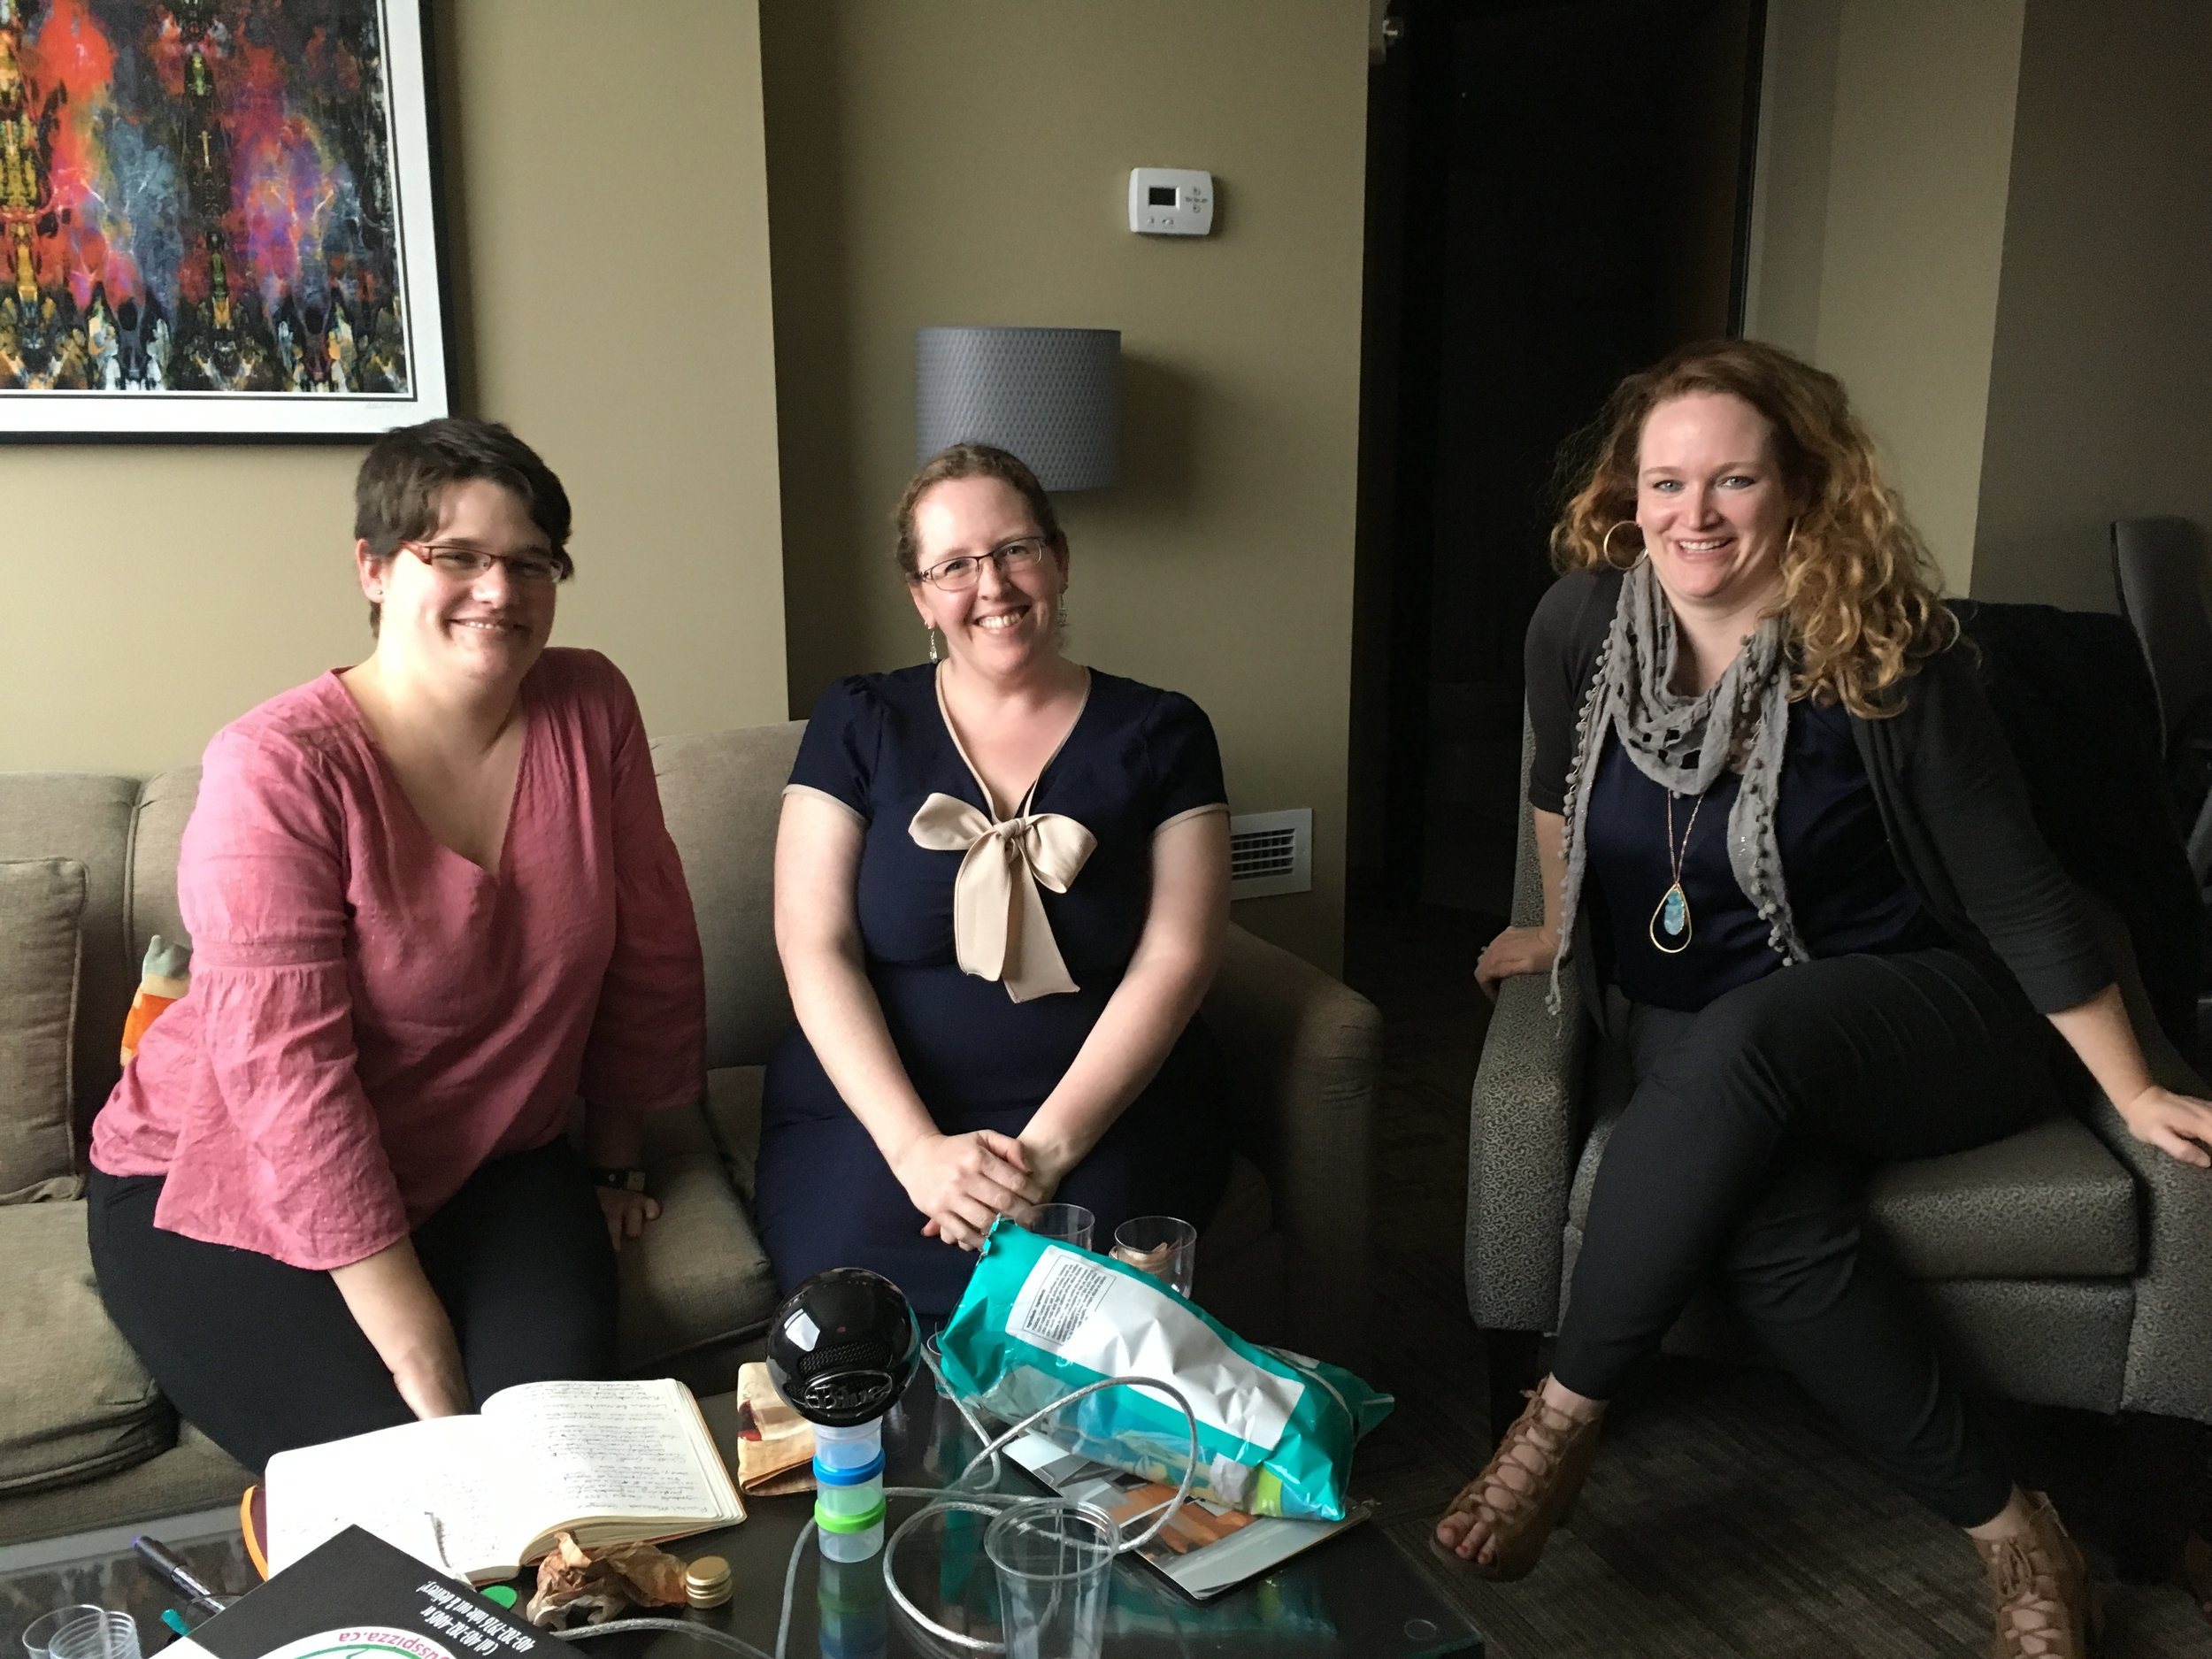 Alison, Melanie, & Melissa